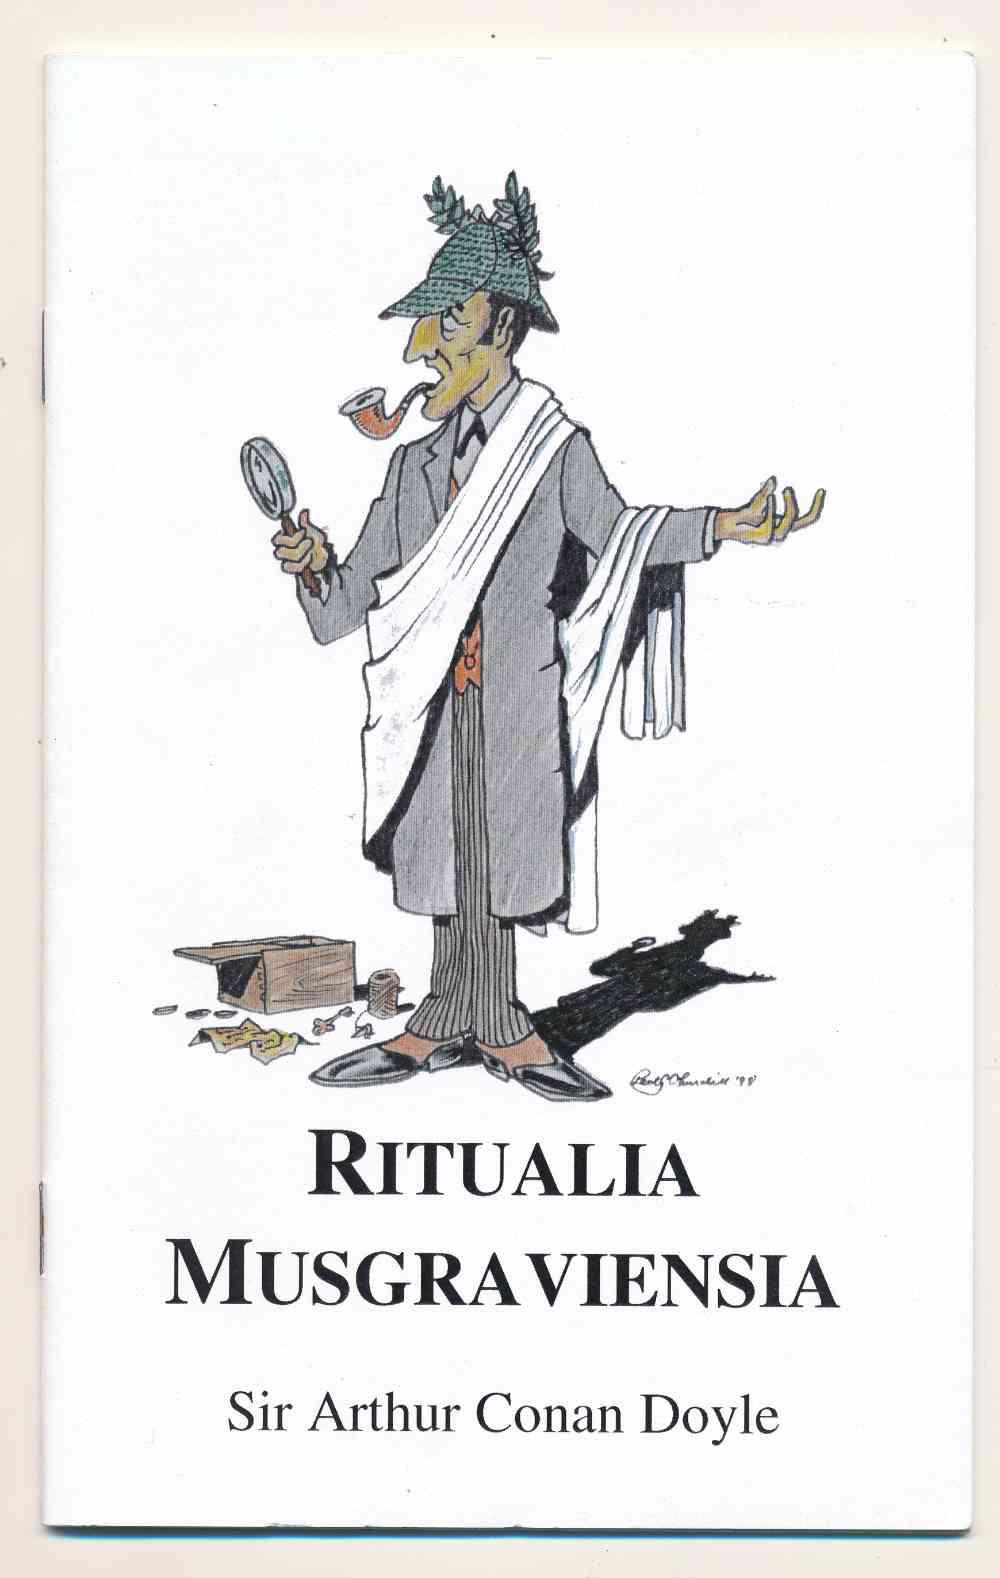 Ritualia Musgraviensia